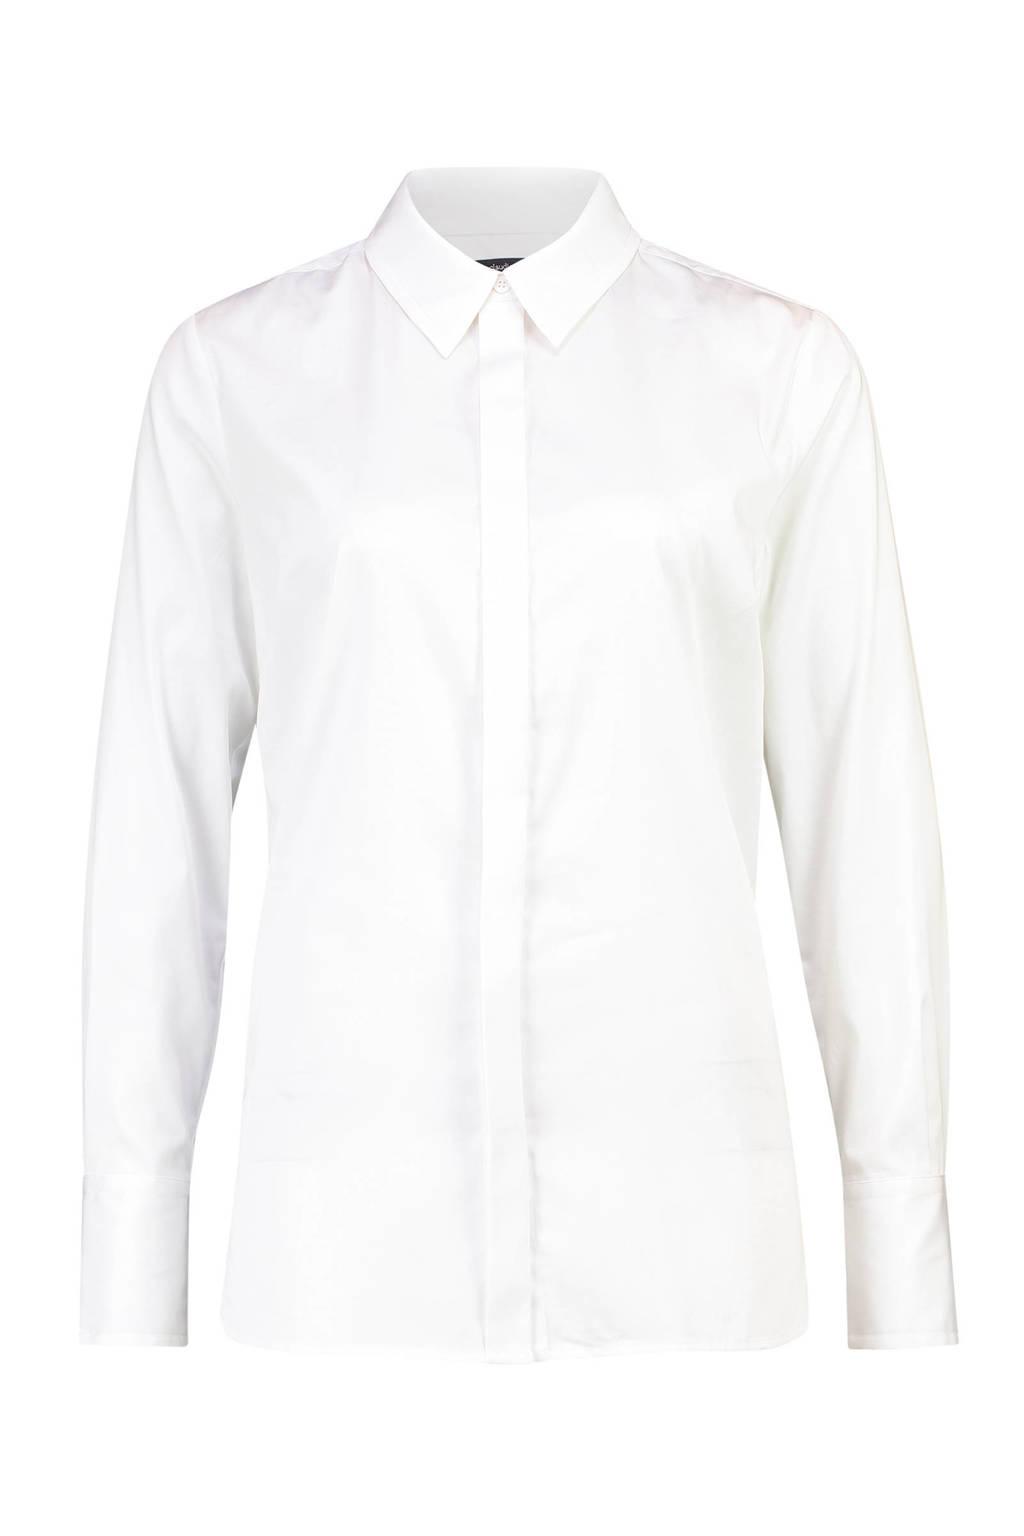 Claudia Sträter blouse Poplin wit, Wit